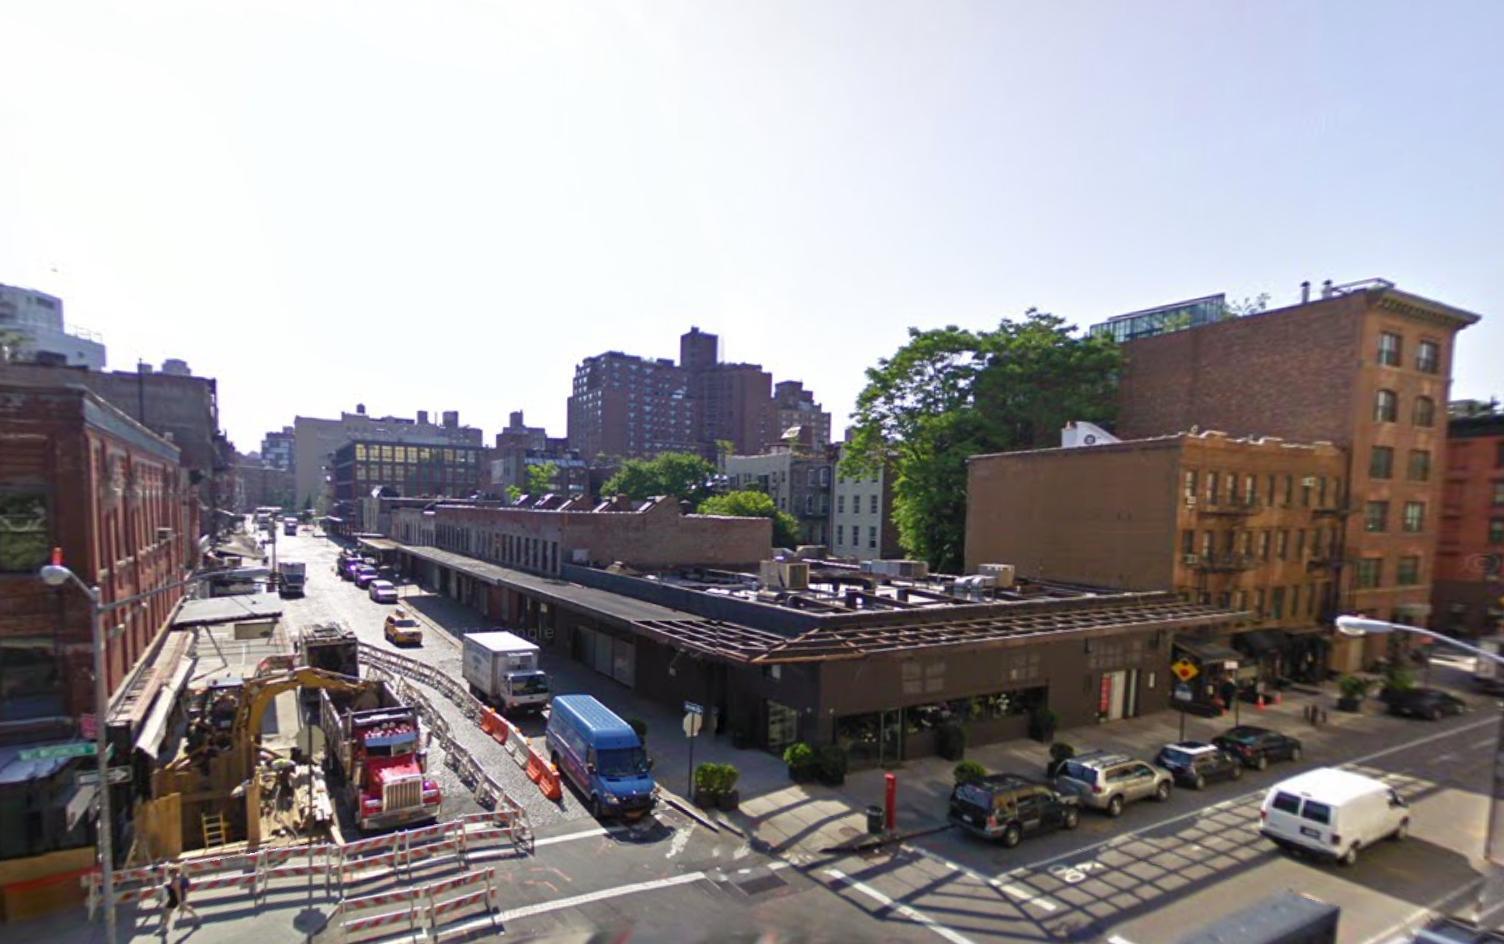 46-74 Gansevoort Street